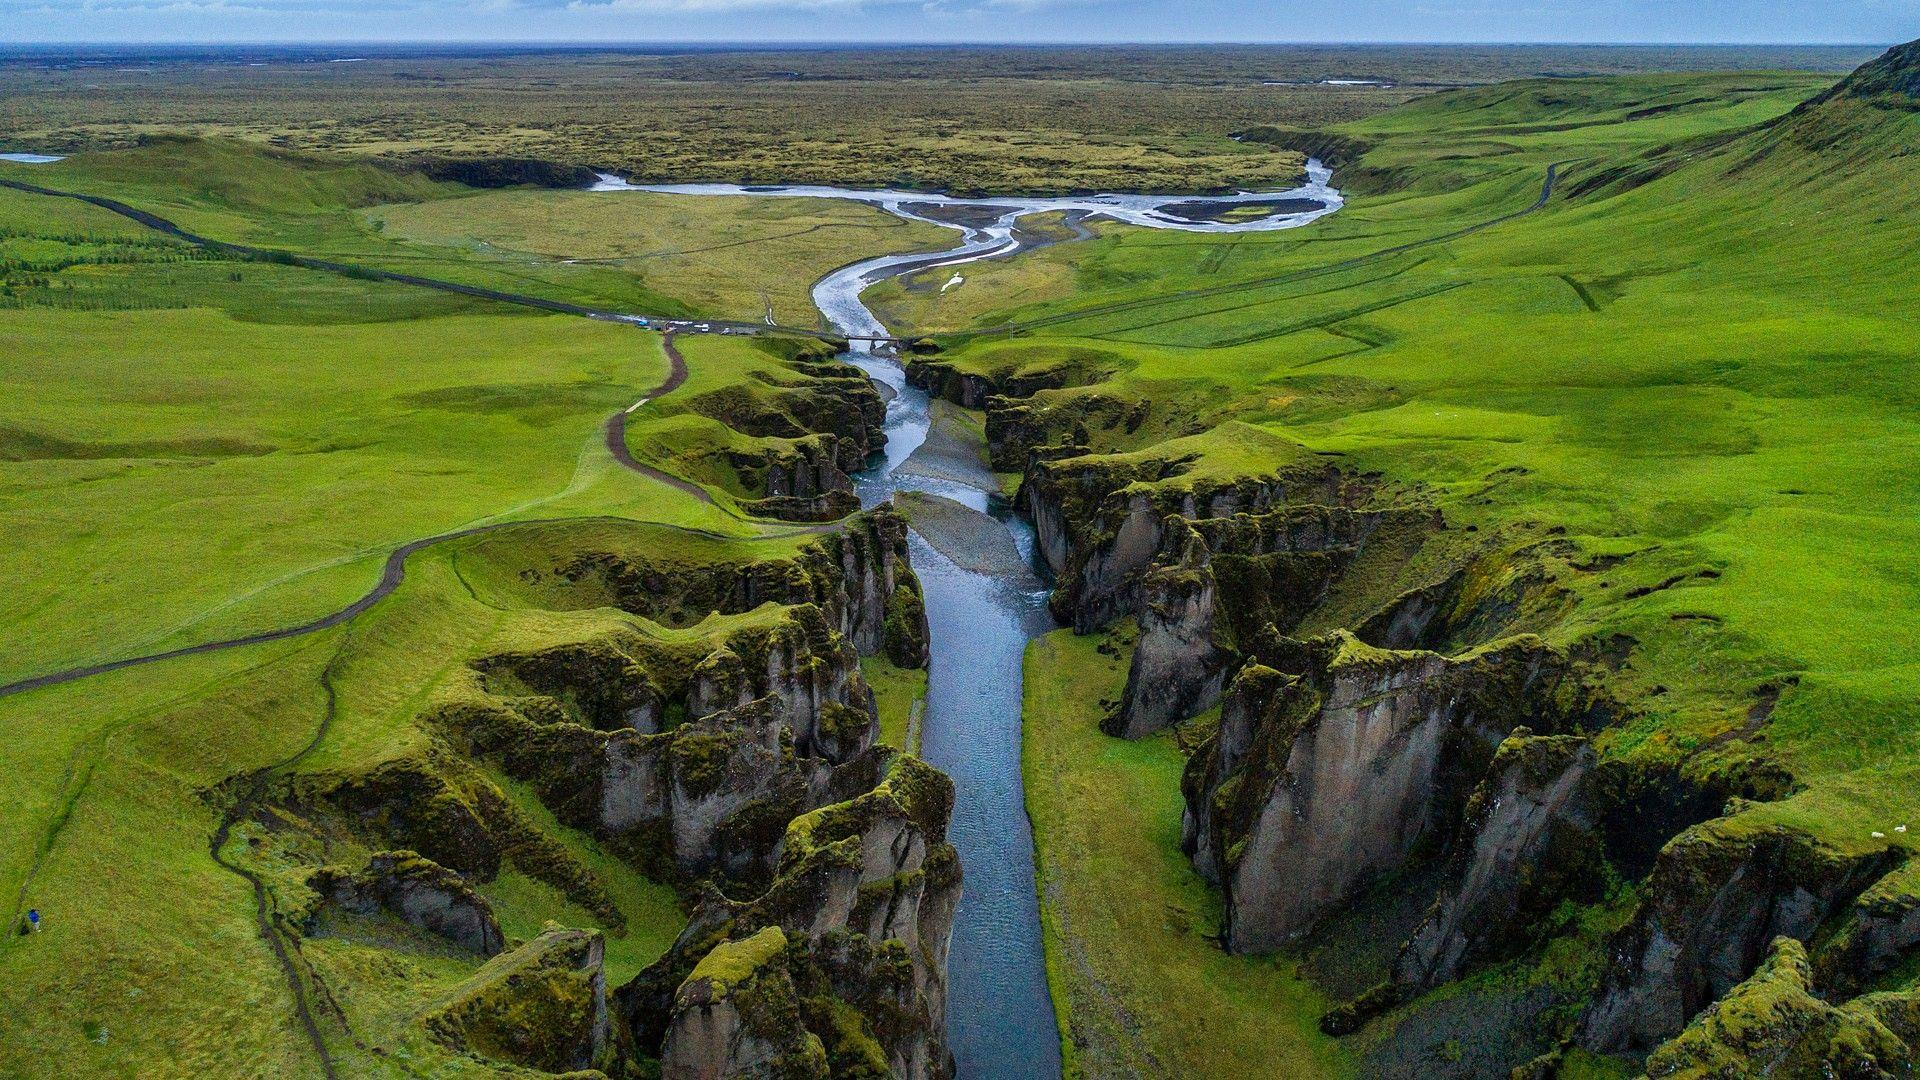 Aerial view of the Fjaðrárgljúfur canyon, Iceland.jpg